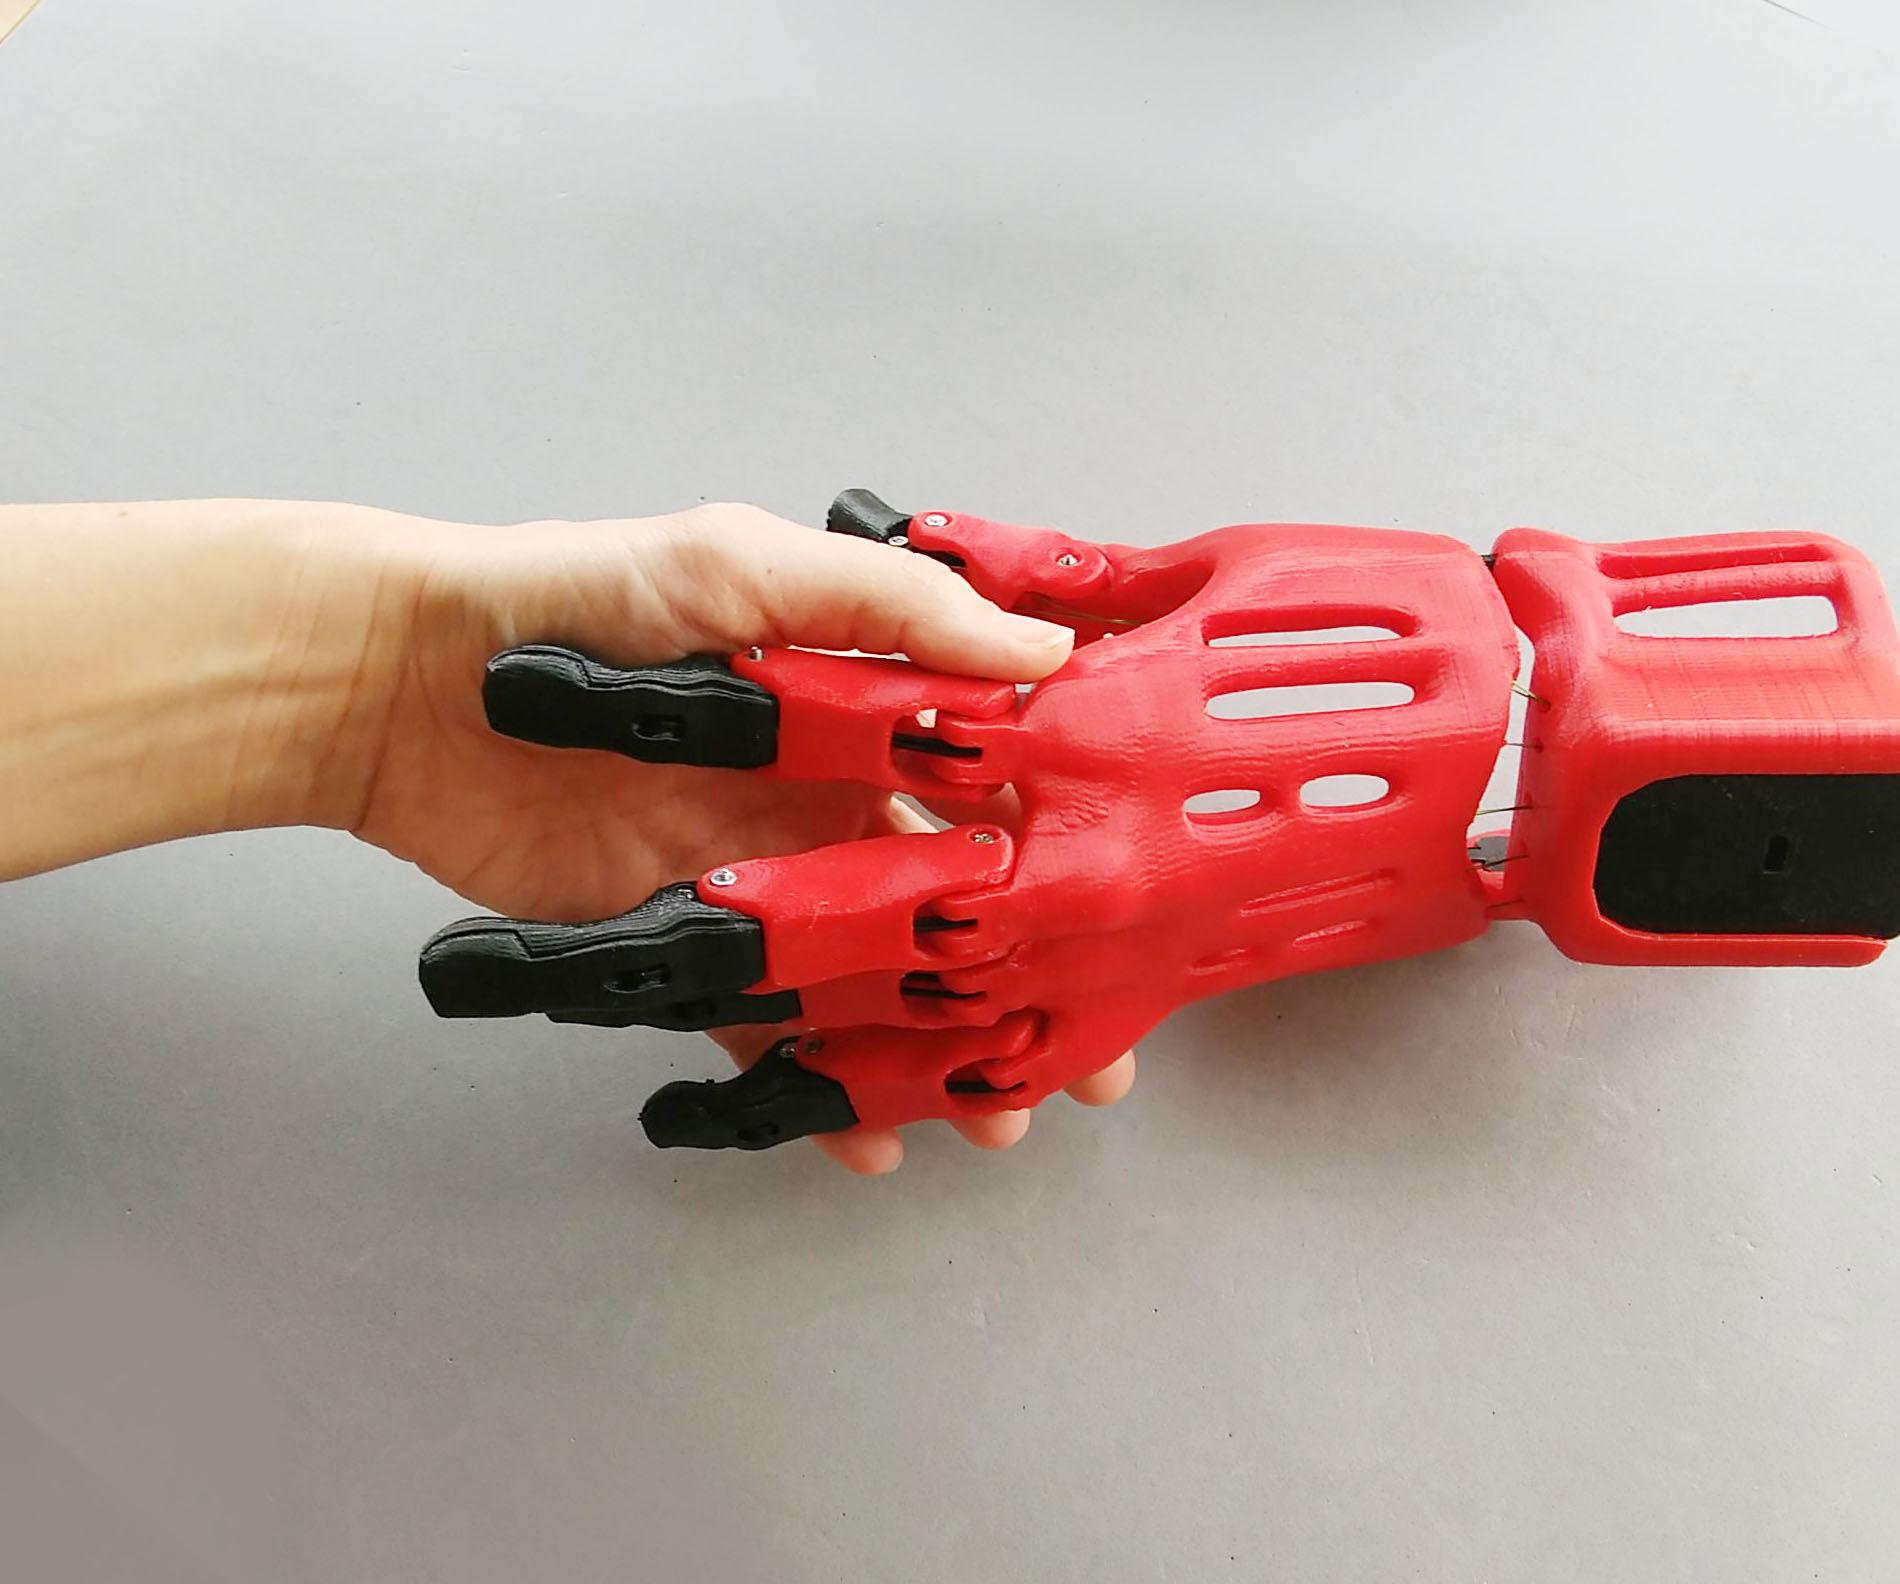 Prothestic Hand